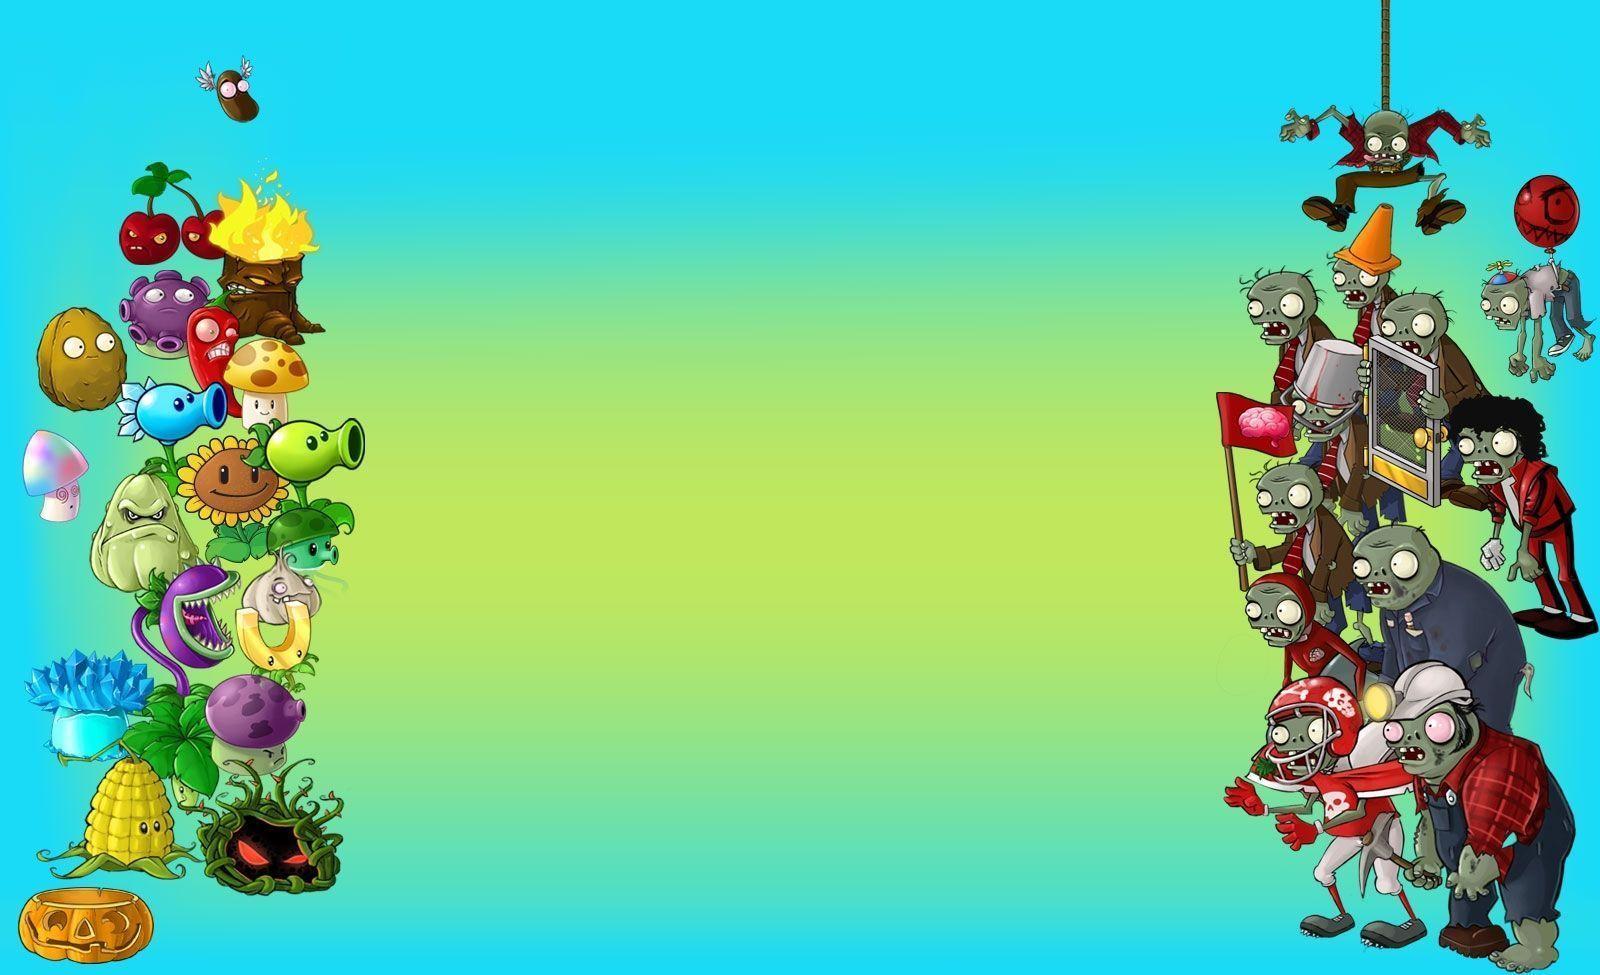 Fadbbfeade Free Templates With Plants Vs Zombies Invitation Template Saab4fun Com Zombie Wallpaper Plants Vs Zombies Birthday Party Plant Zombie